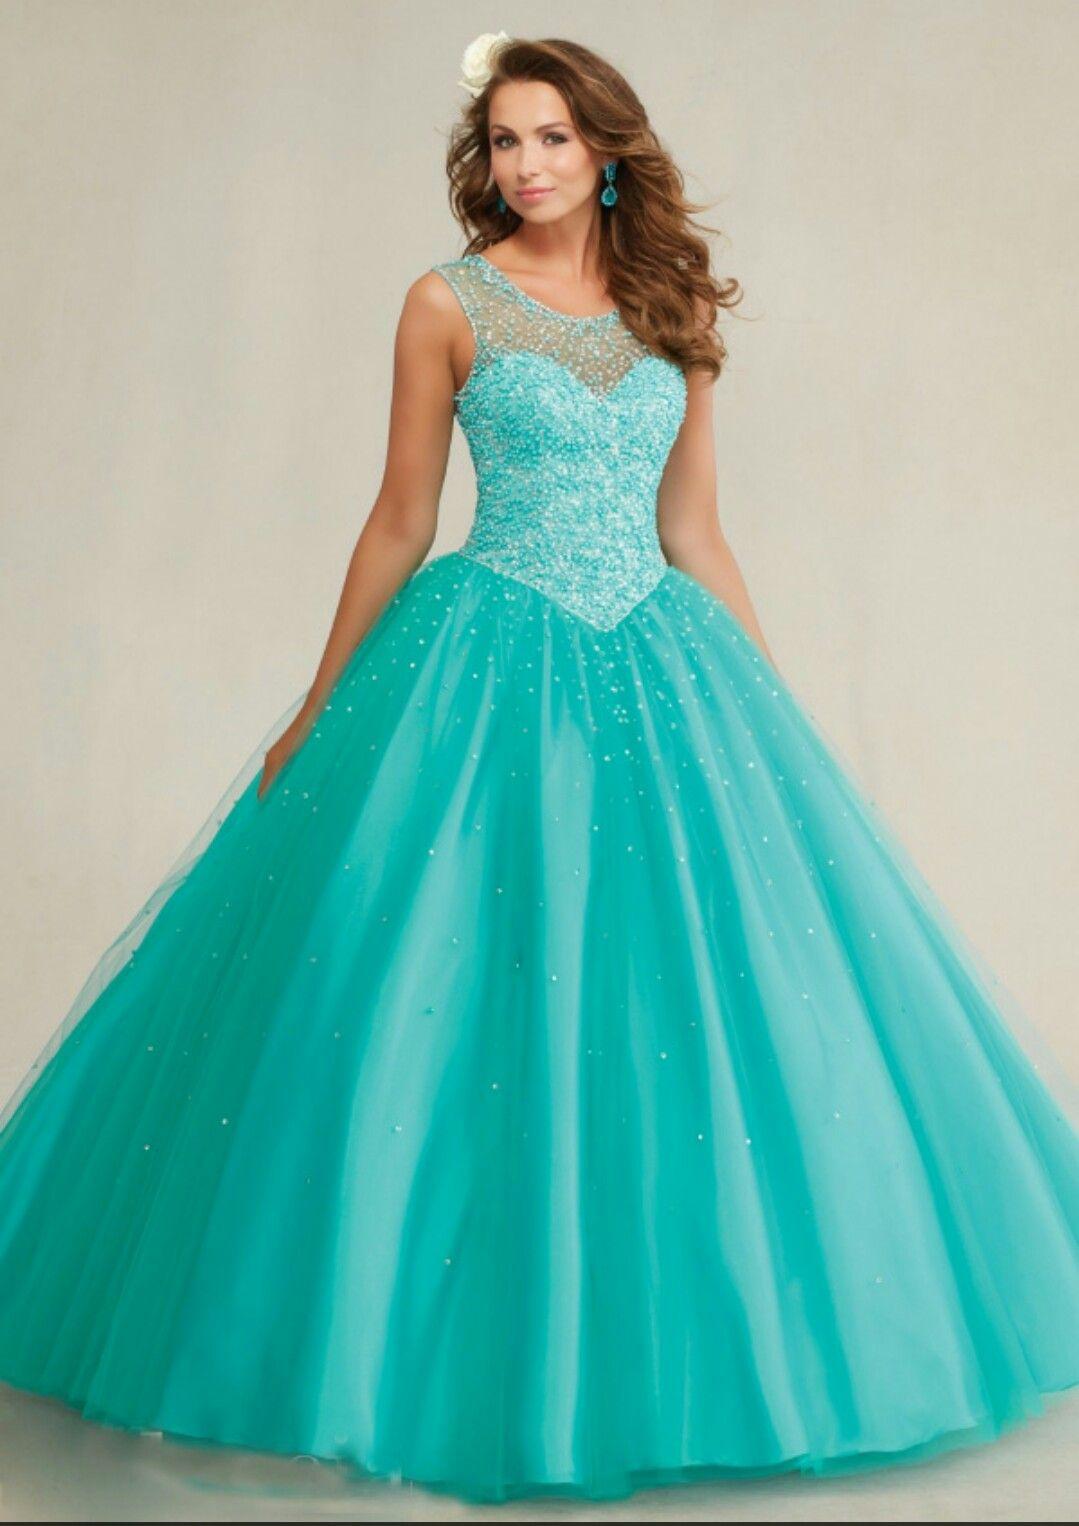 dress layout | Tyanna\'s Sweet 16 Ideas | Pinterest | Layouts, Prom ...